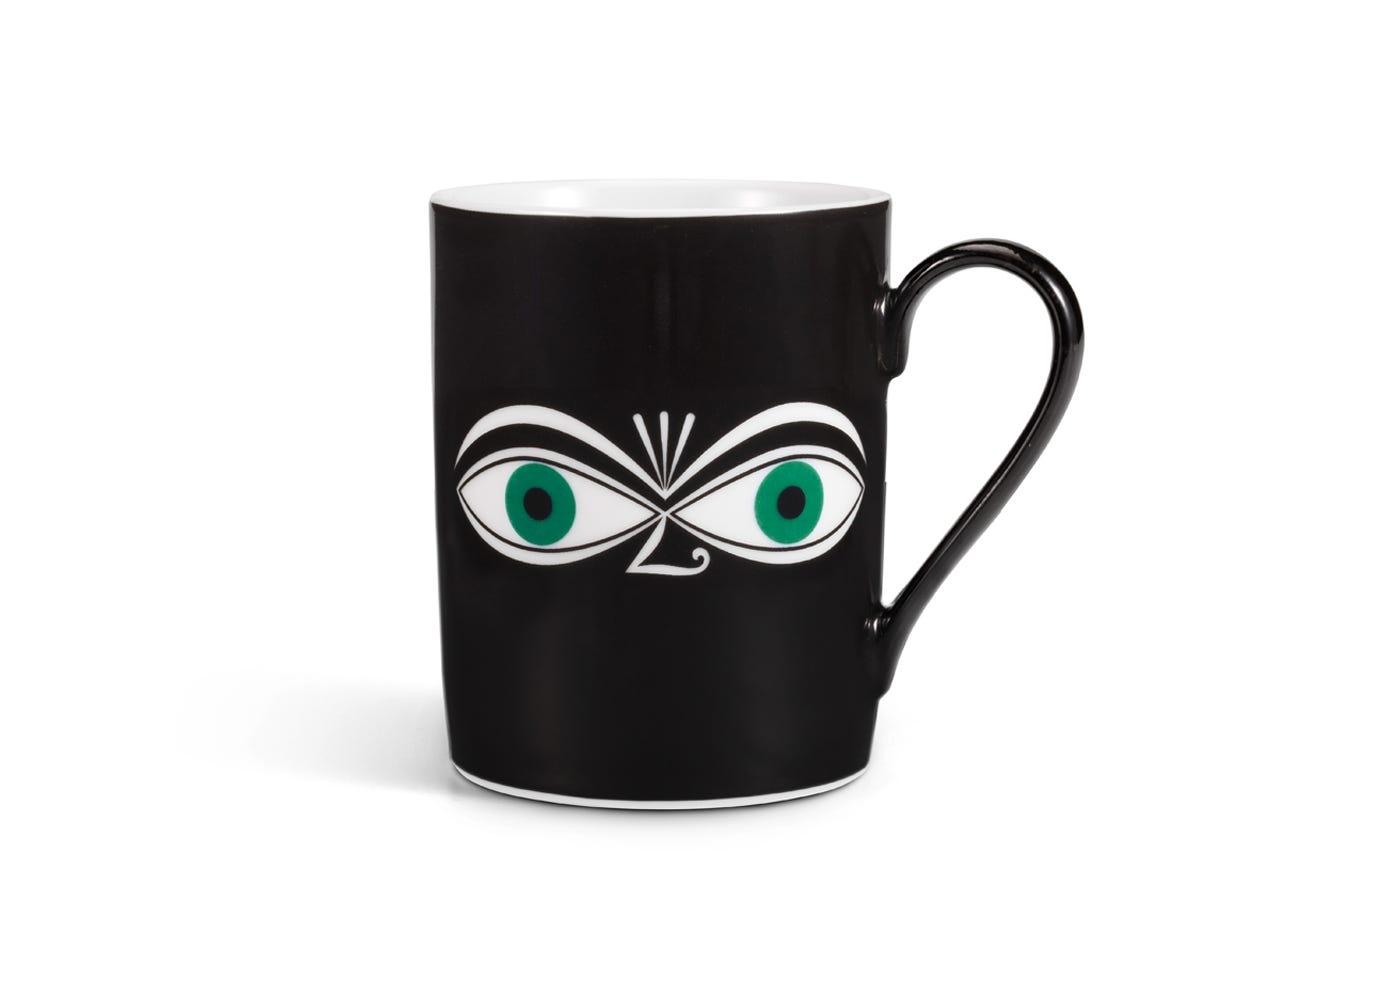 Coffee Mug Eyes Design by Alexander Girard in Green